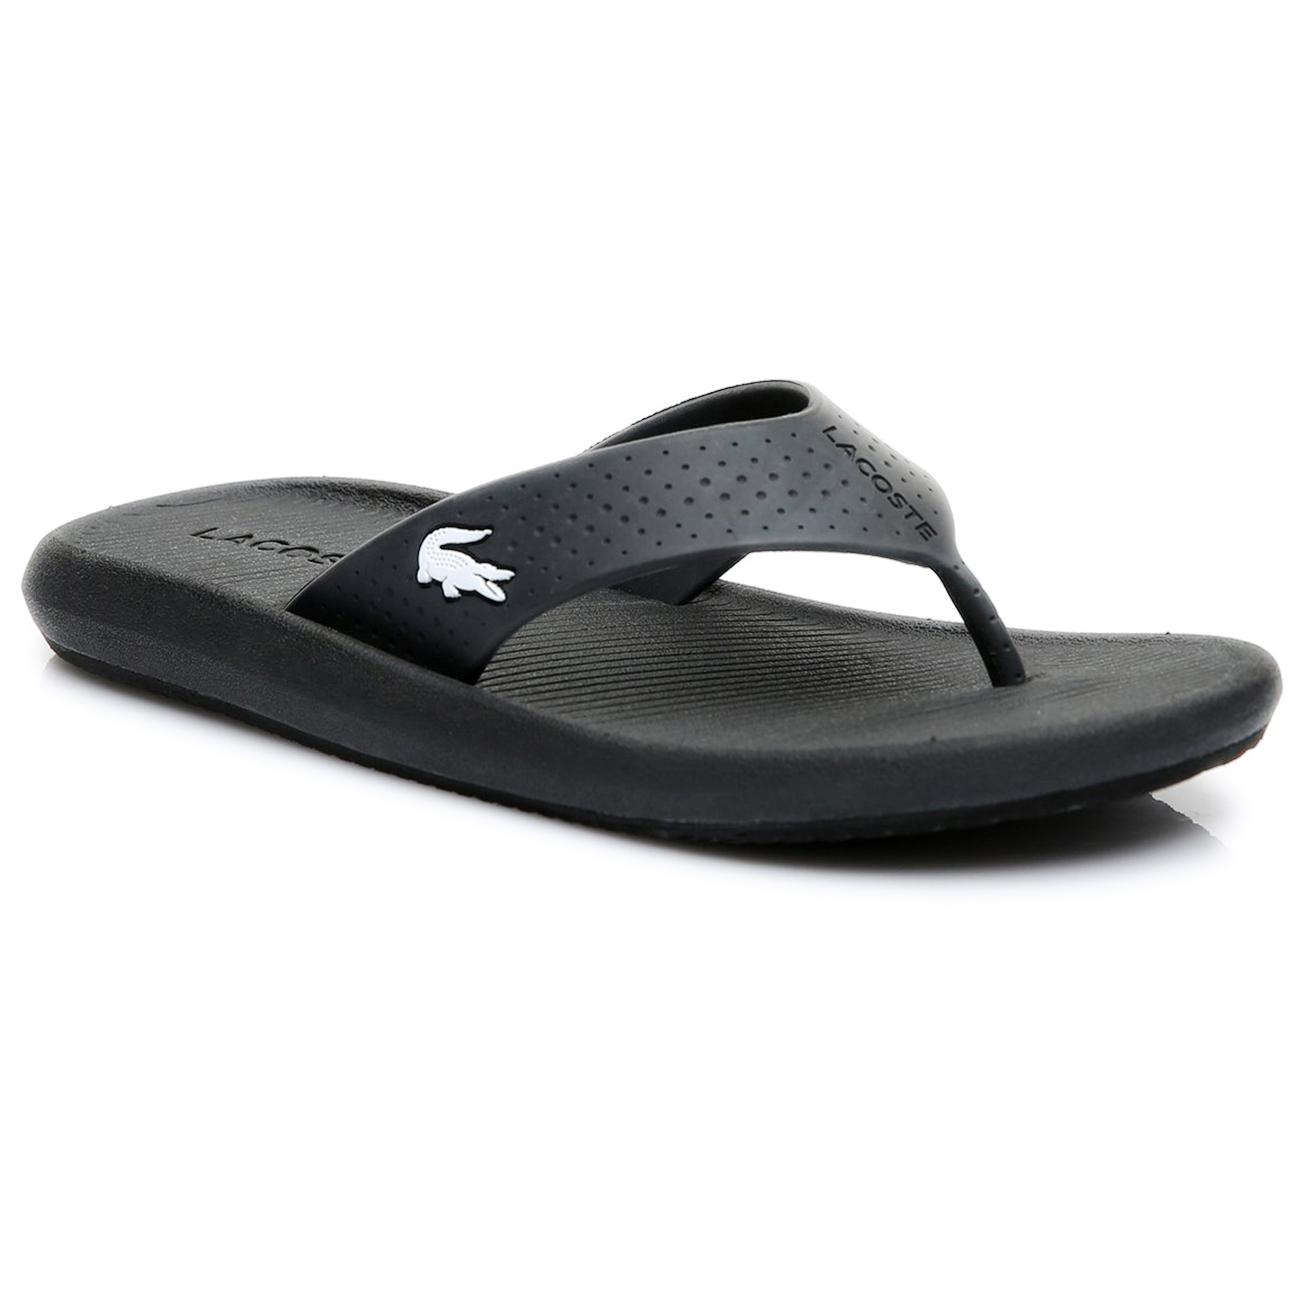 Lacoste Croco Sandal 219 1